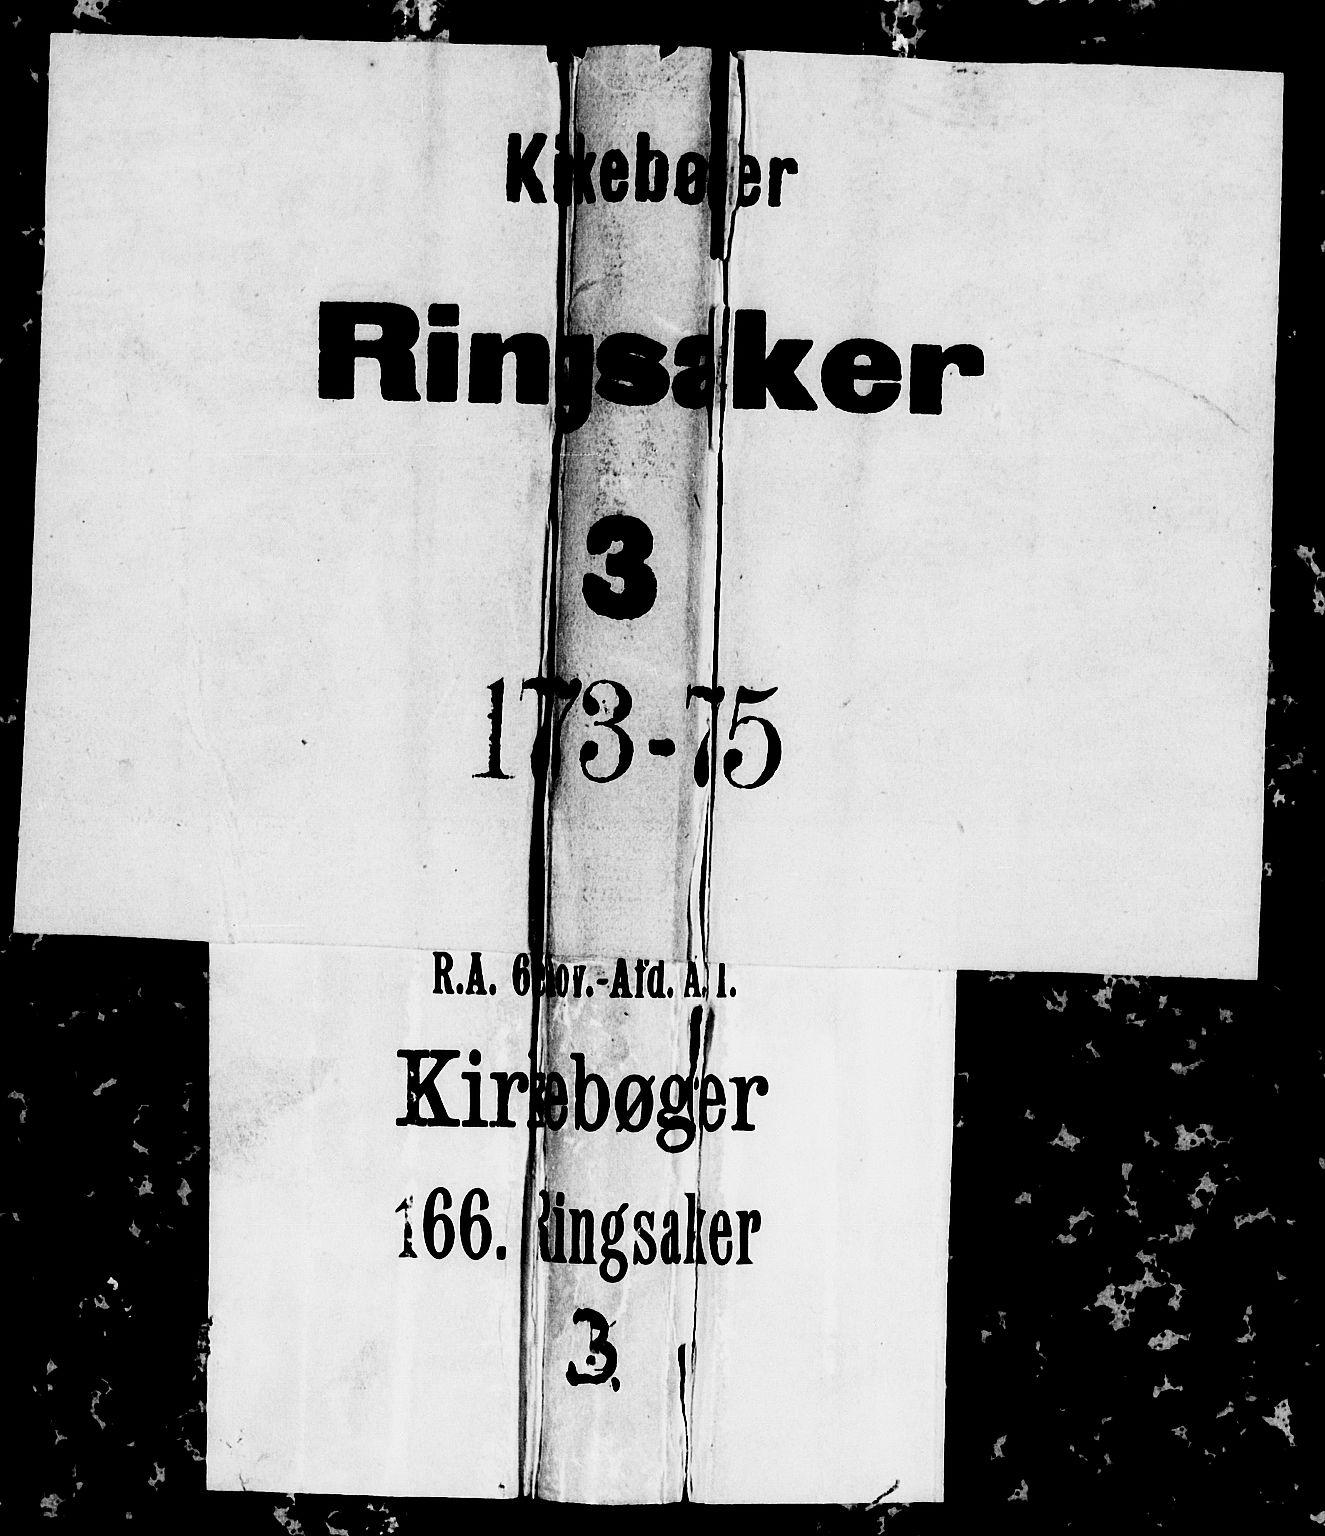 SAH, Ringsaker prestekontor, I/Ia/L0005/0001: Kladd til kirkebok nr. 1A, 1773-1775